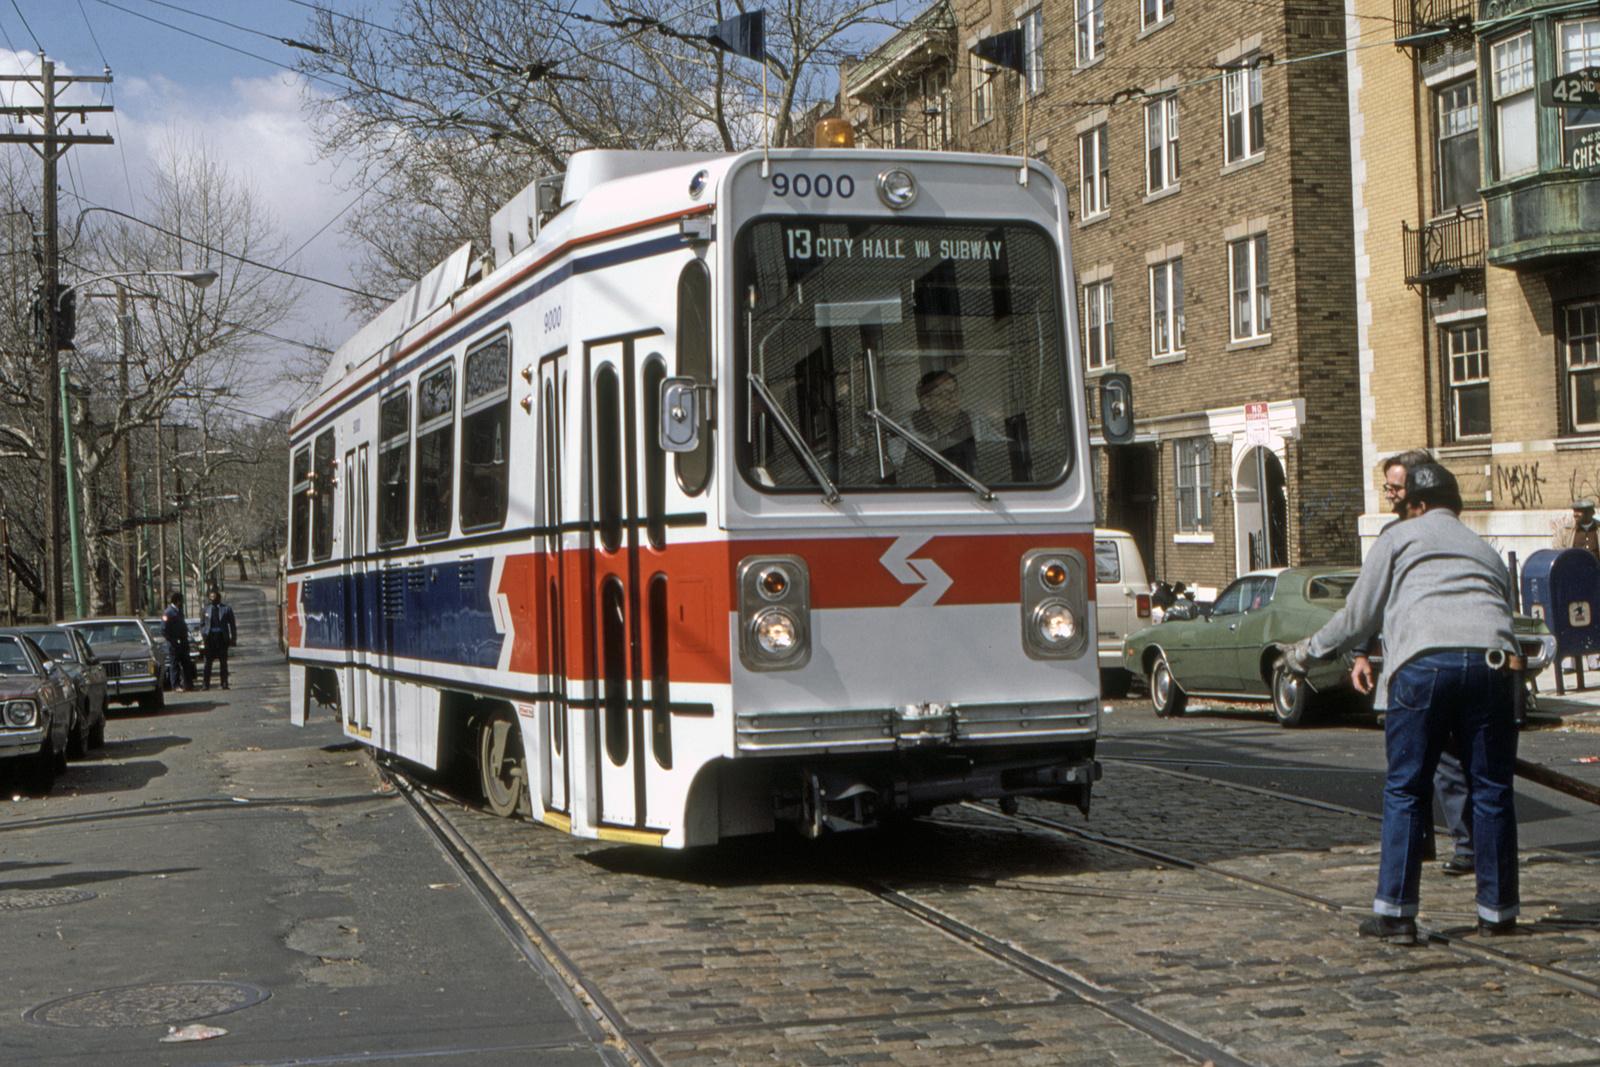 (930k, 1600x1067)<br><b>Country:</b> United States<br><b>City:</b> Philadelphia, PA<br><b>System:</b> SEPTA (or Predecessor)<br><b>Line:</b> Rt. 13-Yeadon/Darby<br><b>Location:</b> Chester/42nd<br><b>Car:</b> SEPTA K Single-ended (Kawasaki, 1981) 9000 <br><b>Collection of:</b> David Pirmann<br><b>Date:</b> 3/1981<br><b>Viewed (this week/total):</b> 0 / 108